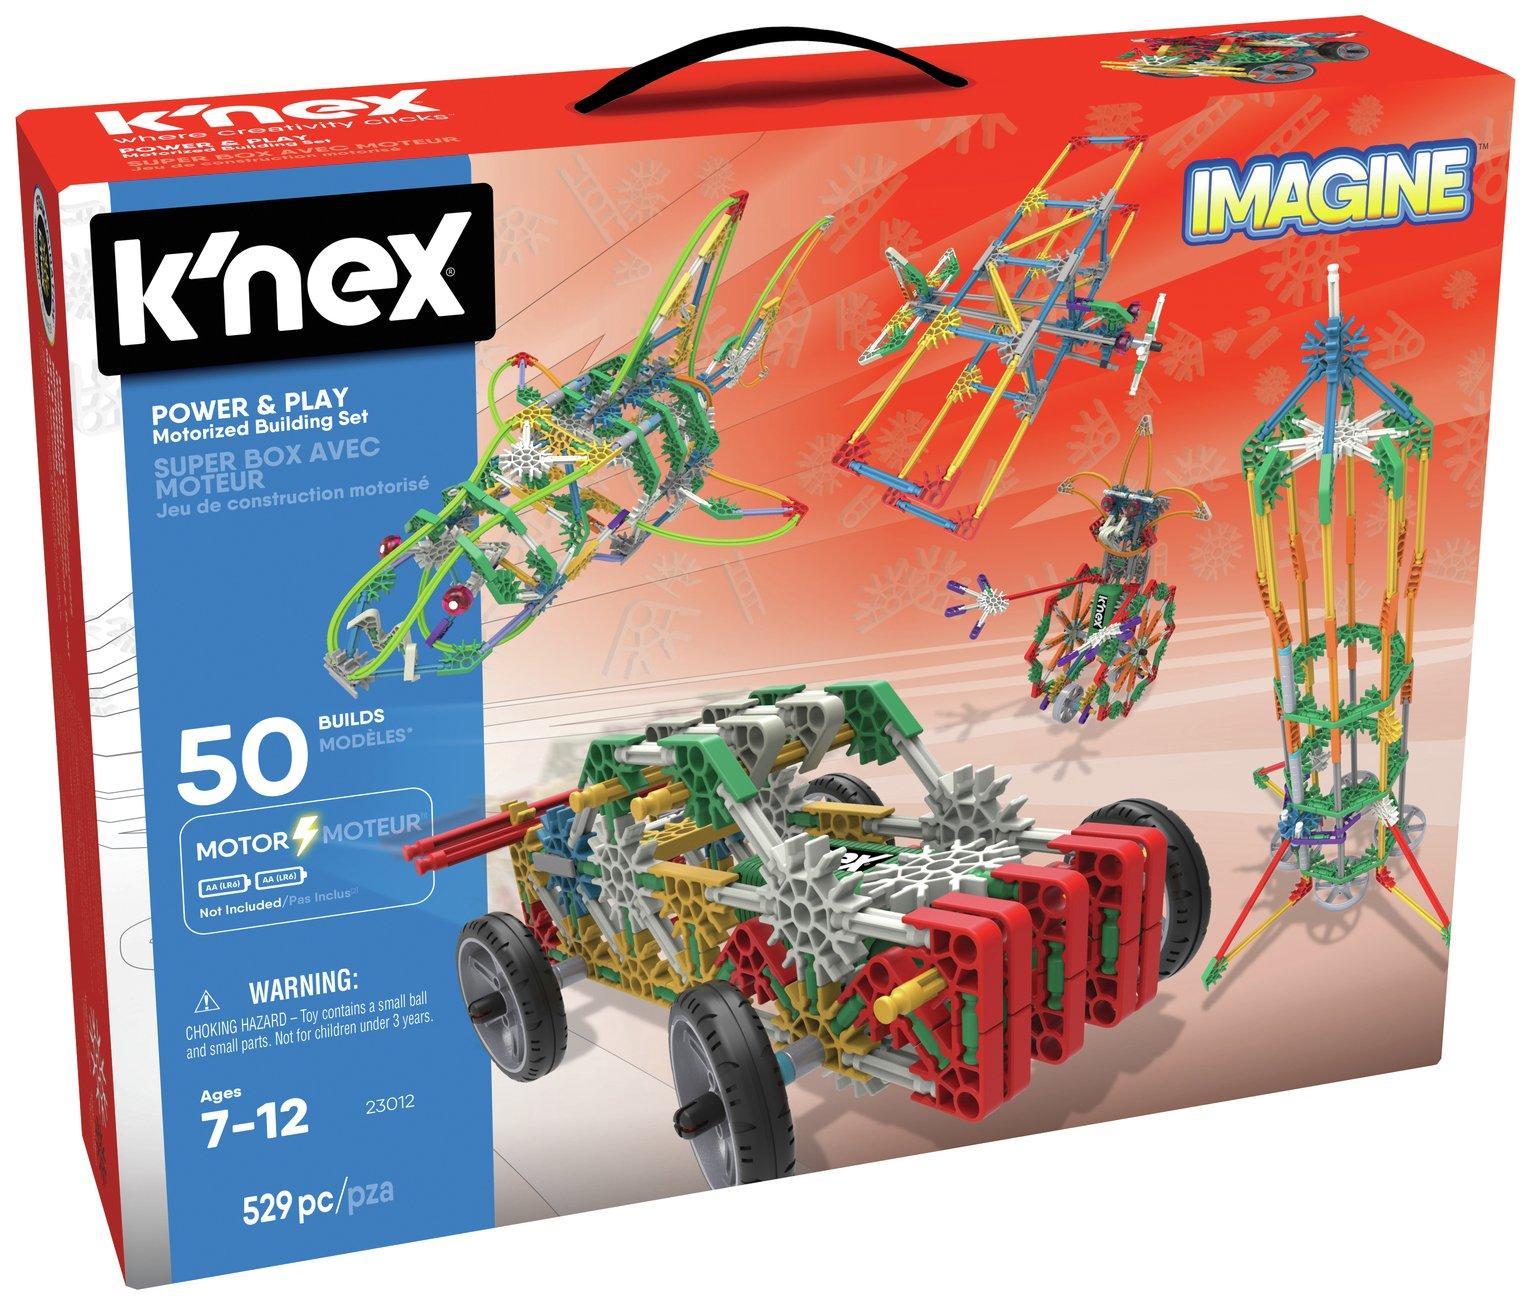 K'NEX Imagine Power and Play 50 Model Motorised Building Set